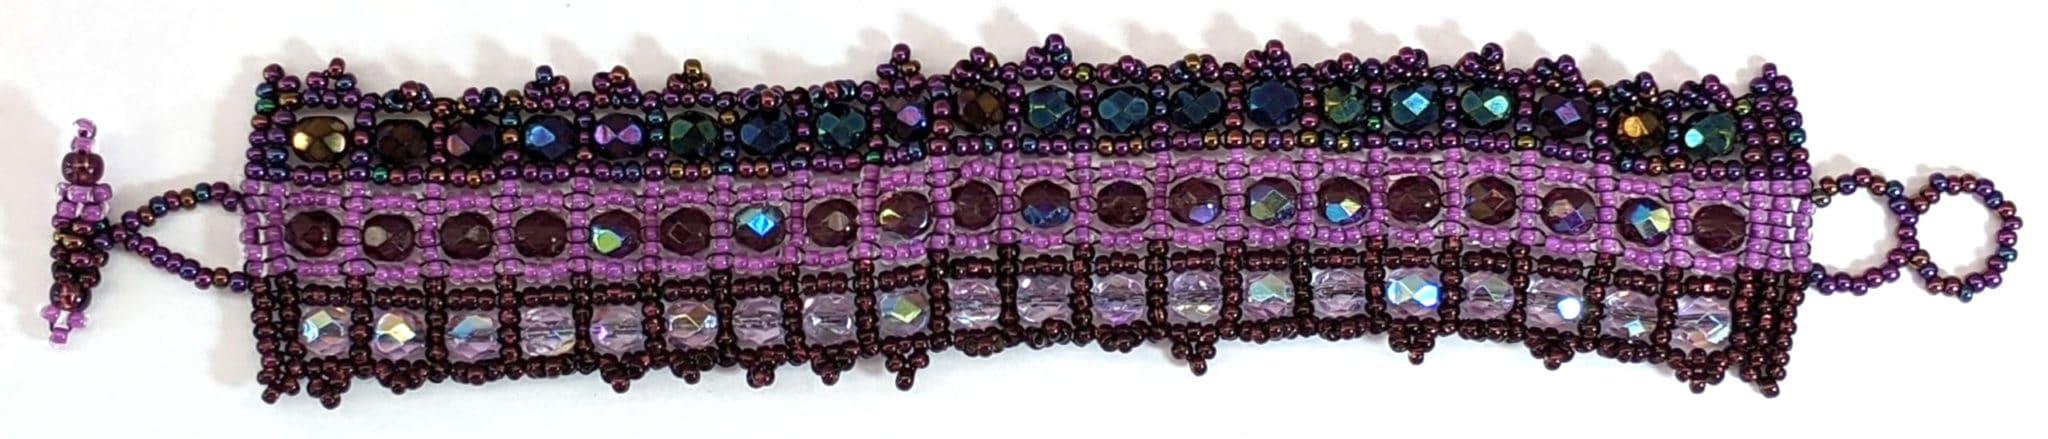 Crystals Bracelet - Purples